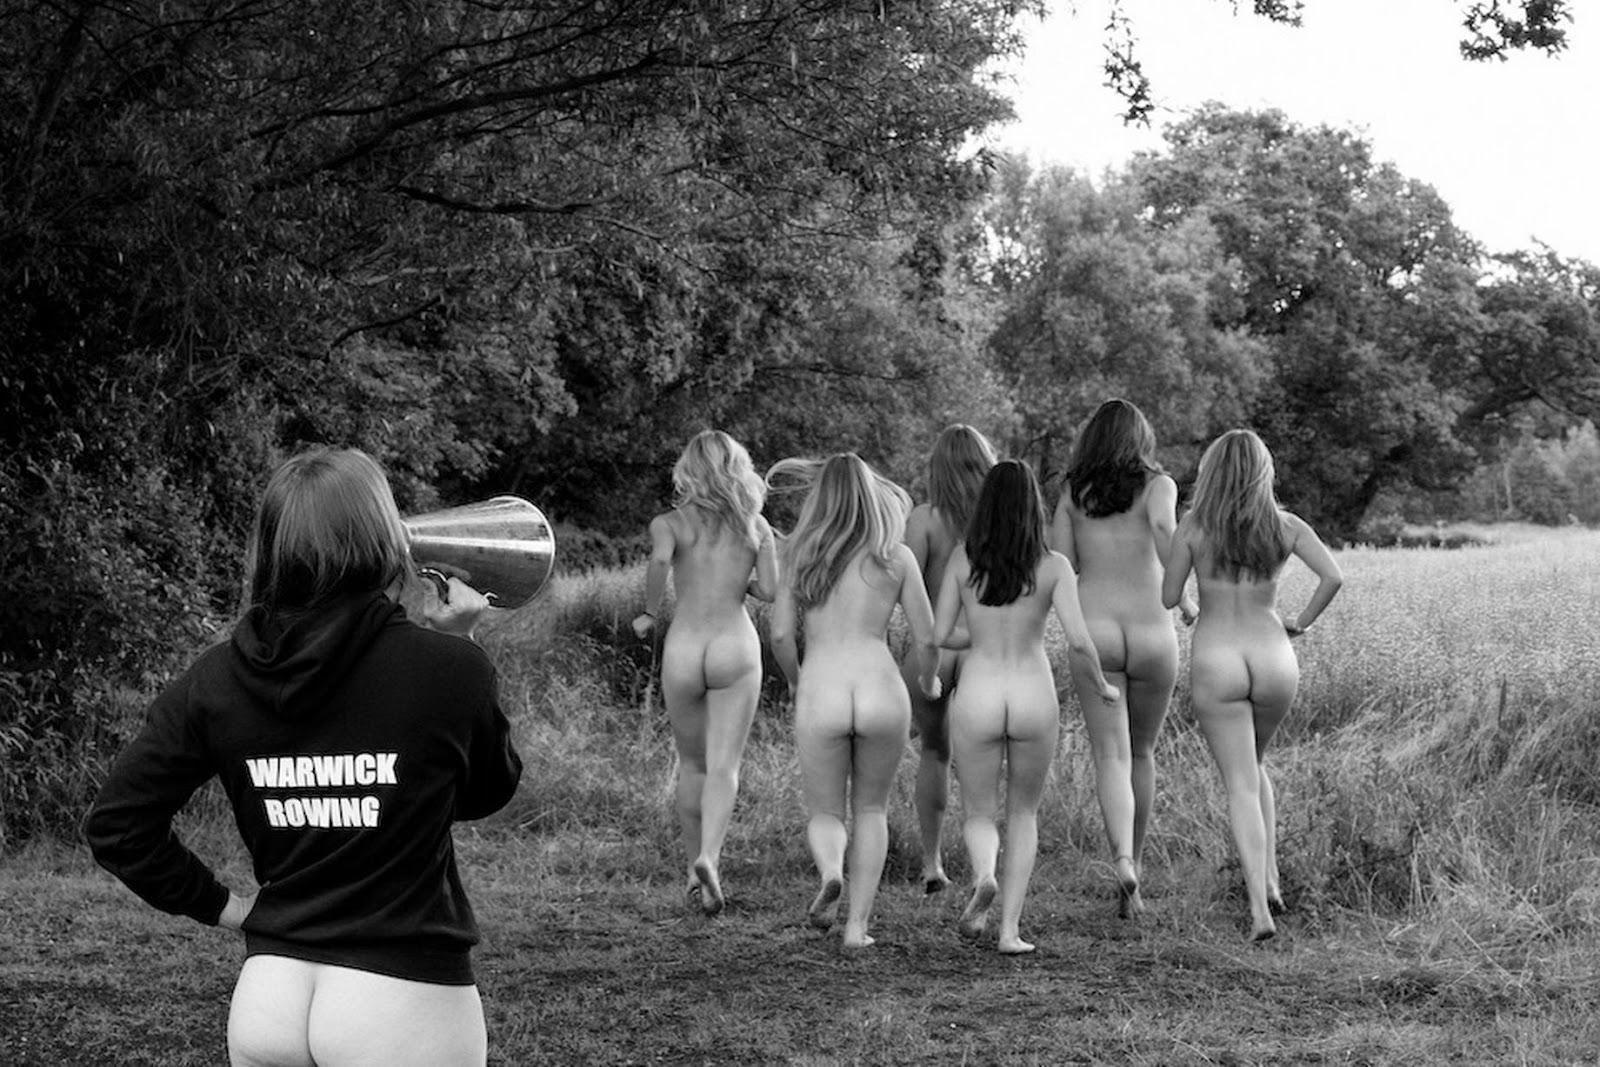 Girl calendar nude sports team